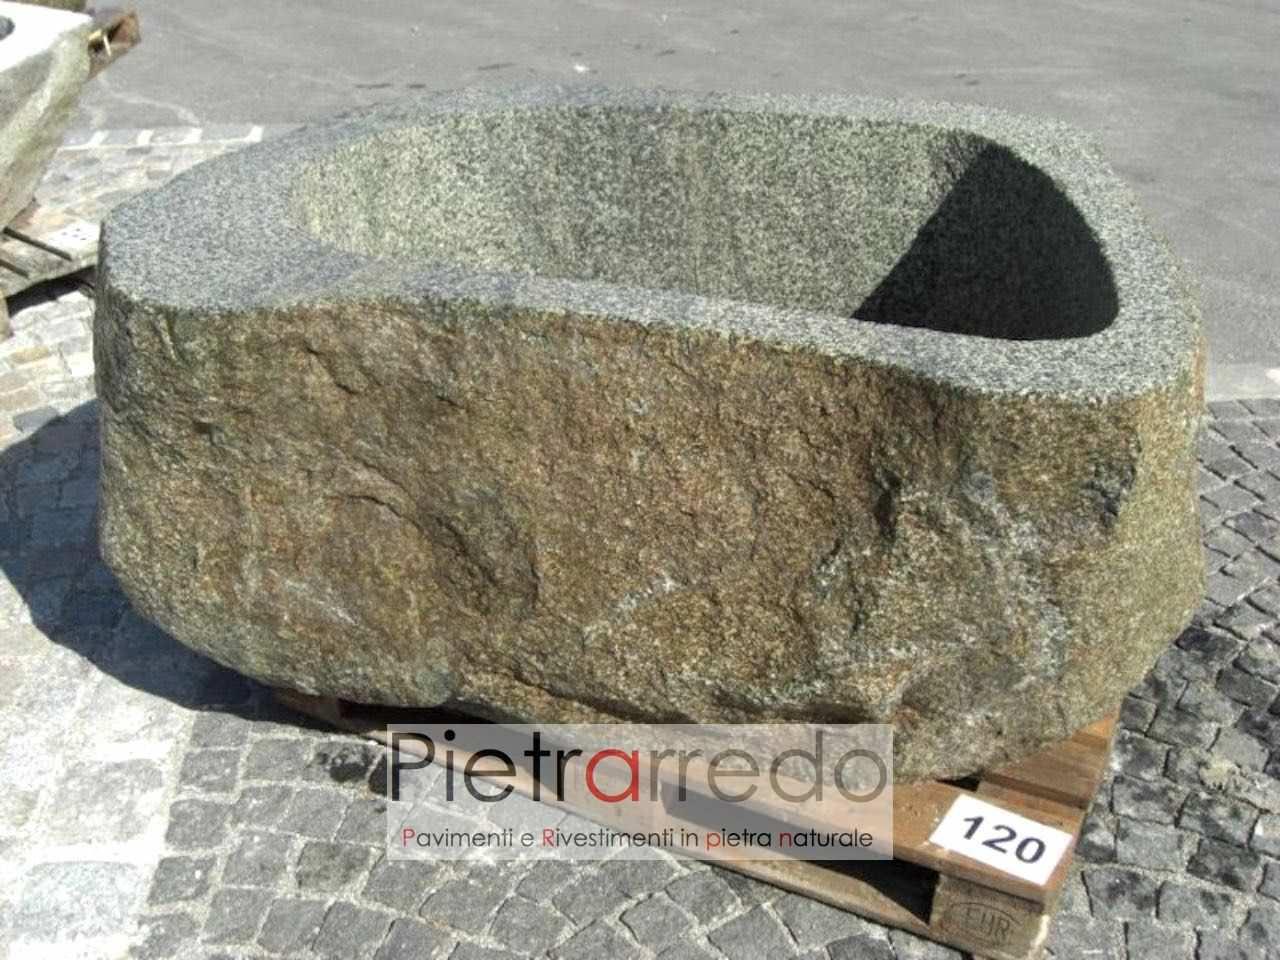 Vasche In Pietra Per Fontane vasche in pietra grezza, sassi di fiume giganti tagliati e scavati a mano